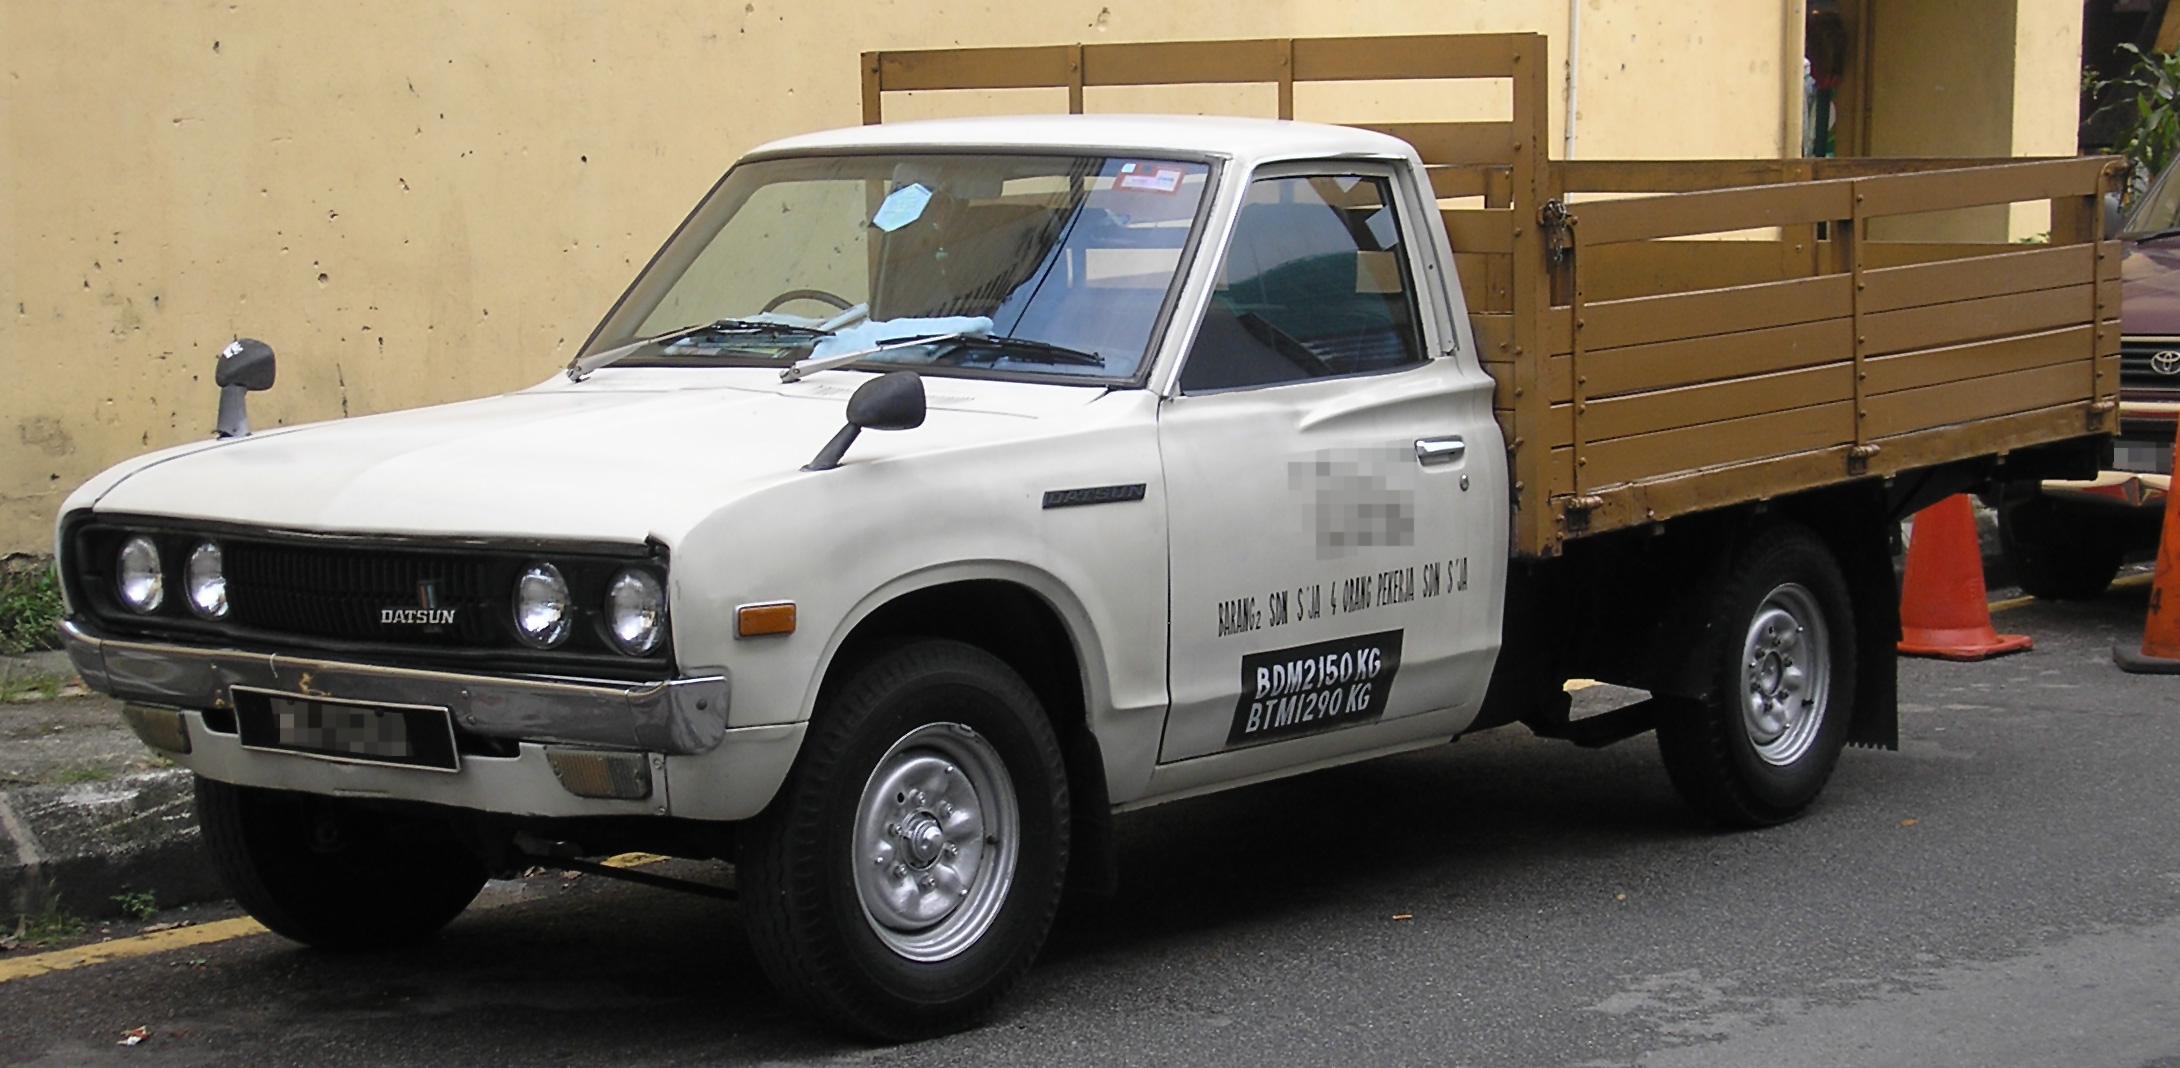 Blue 1986 Datsun Vanette - want to swap - 620 ute